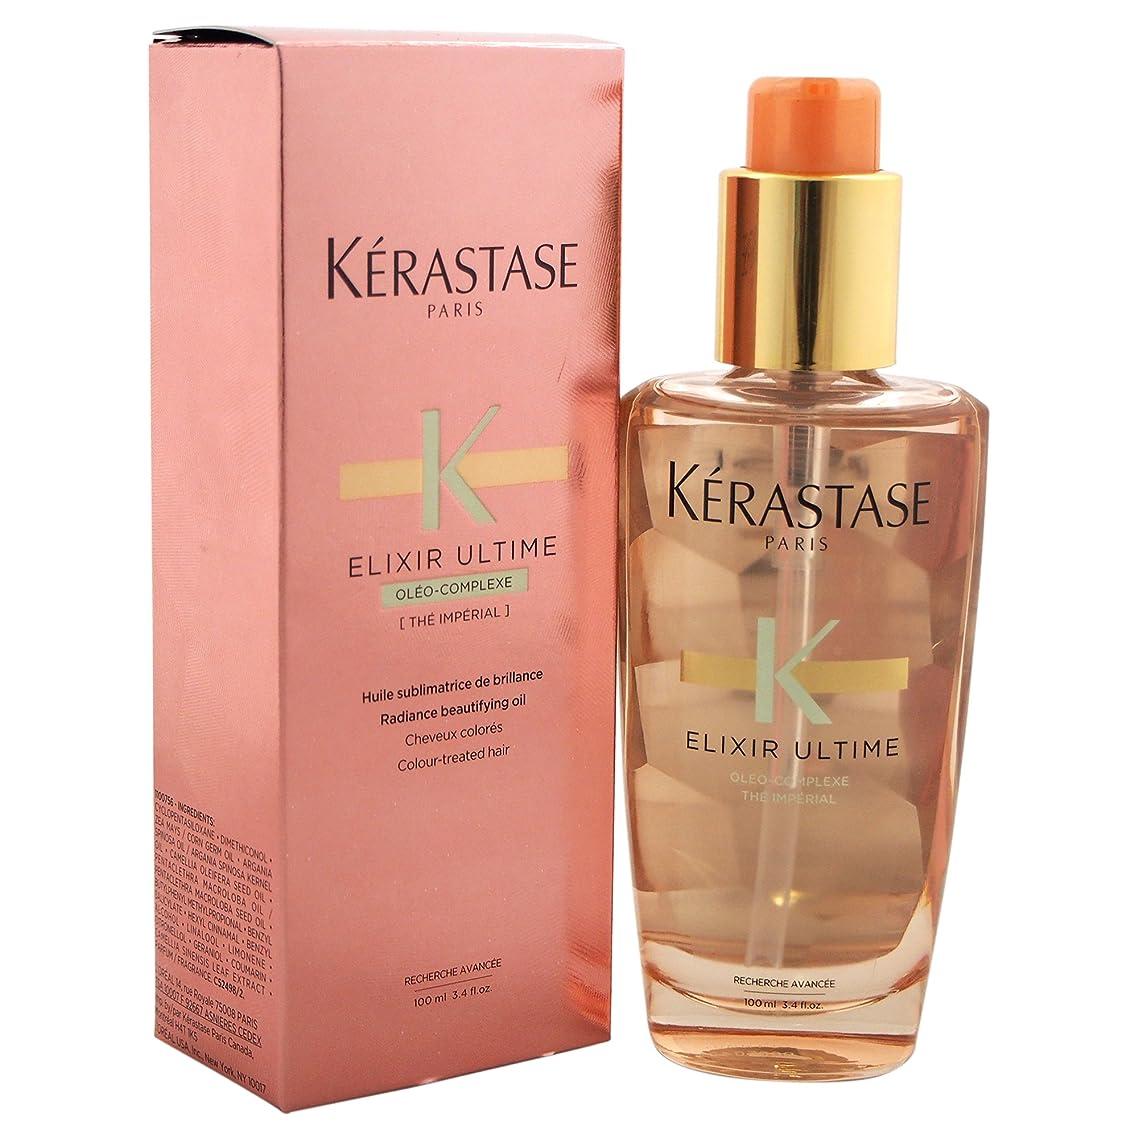 Kerastase Elixir Ultime OleoComplexe Radiance Beautifying Oil, 3.4 Ounce